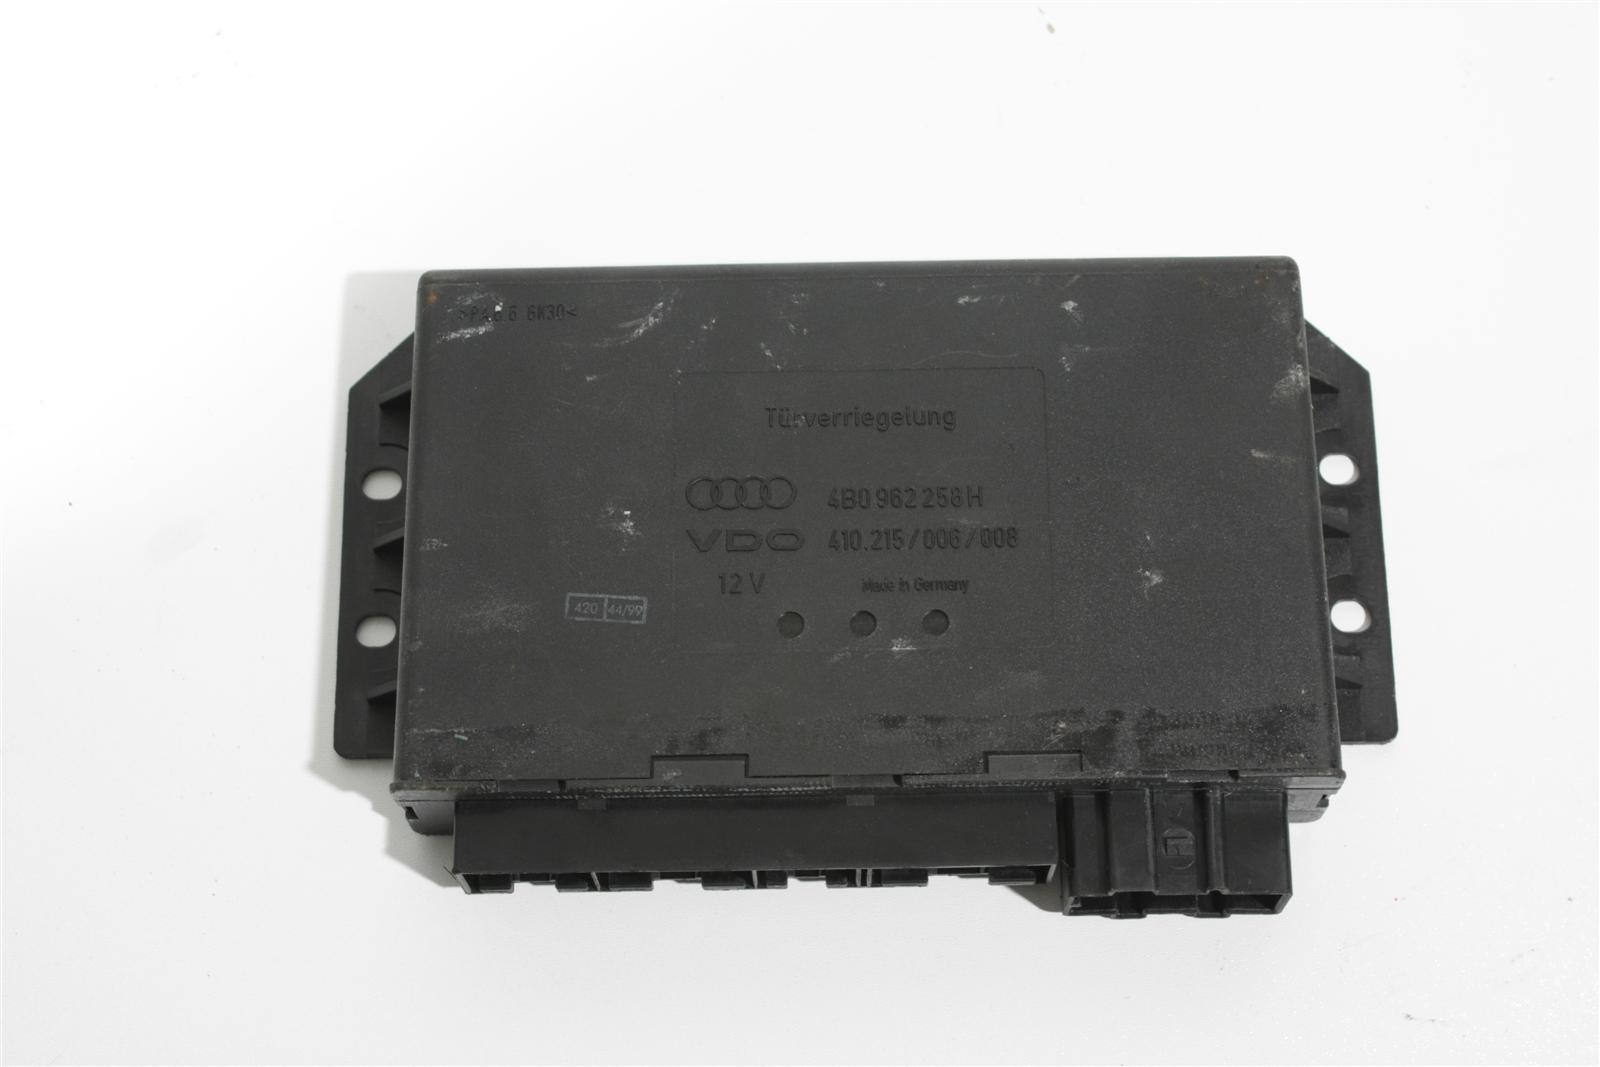 Audi A6 4B Steuergerät Türverriegelung Diebstahlwarnanlage 4B0962258H